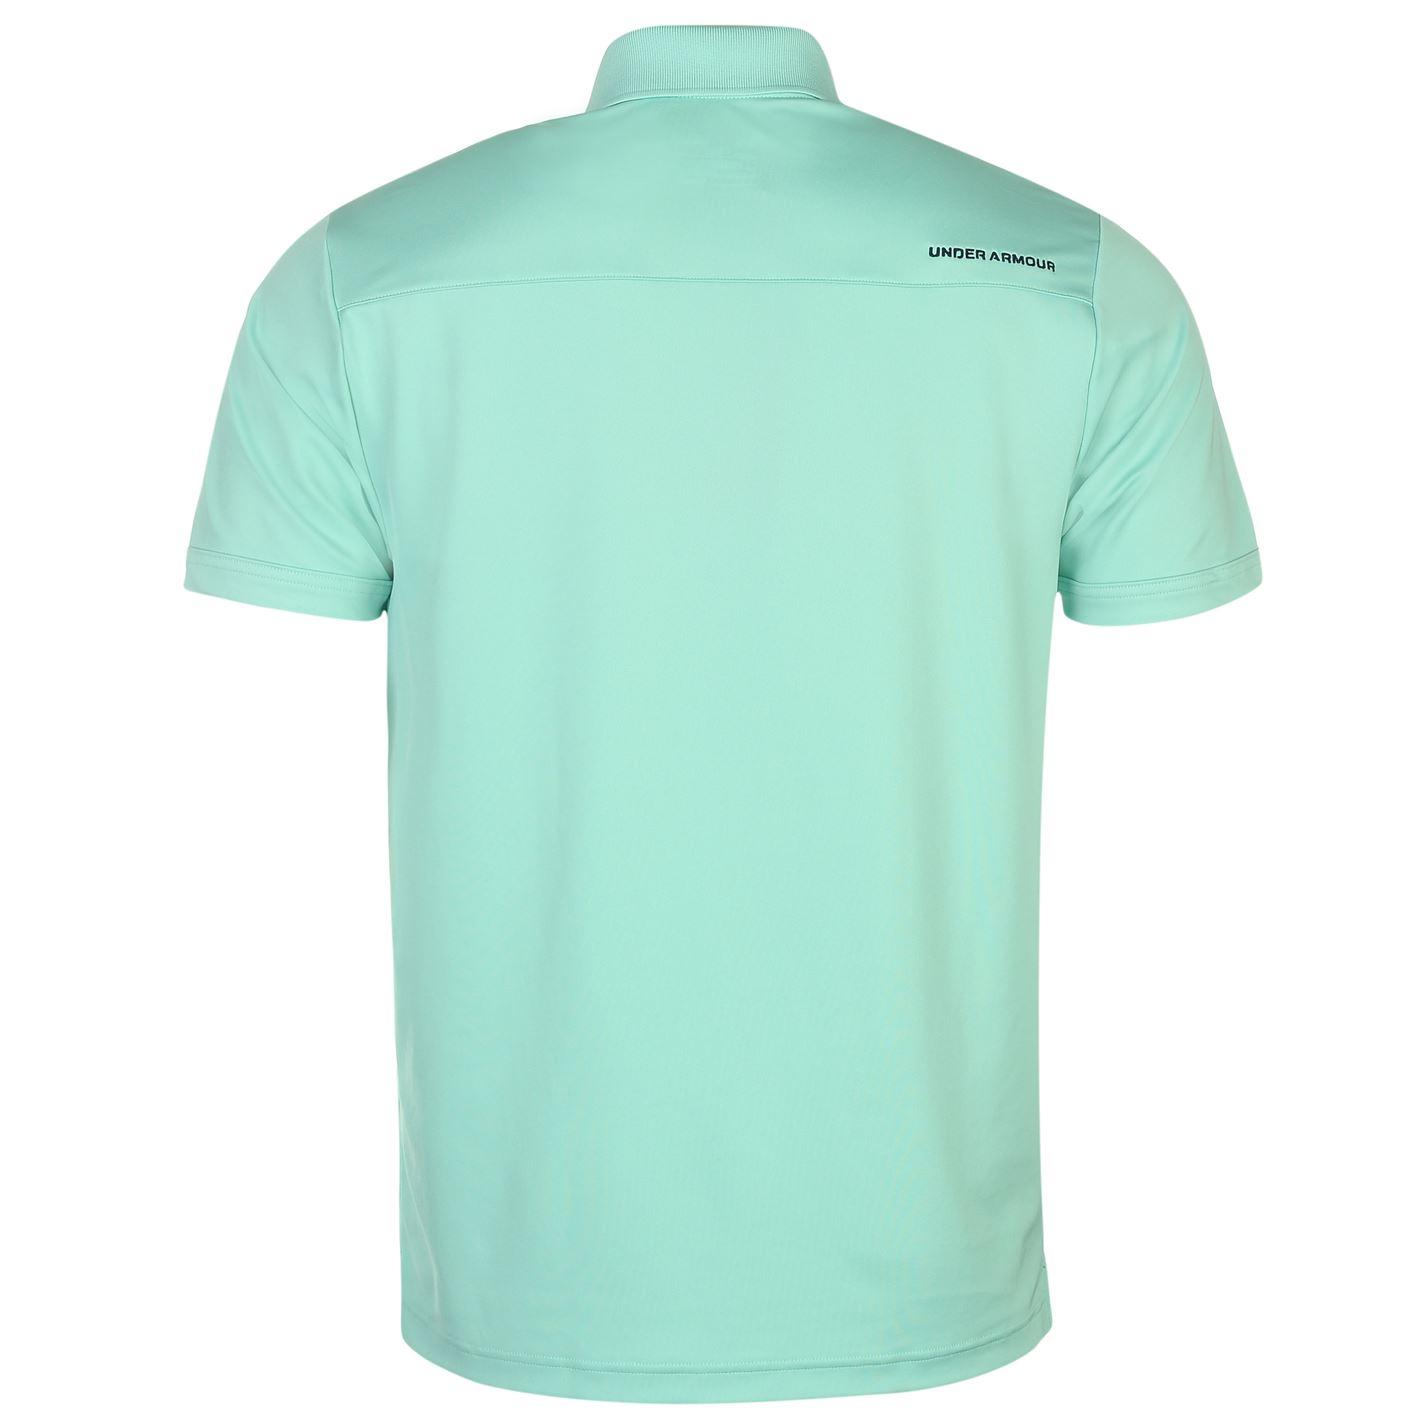 Under-Armour-Camiseta-Polo-para-hombre-realizar-Manga-Corta-Camiseta-Top-Golf-Deportes miniatura 22